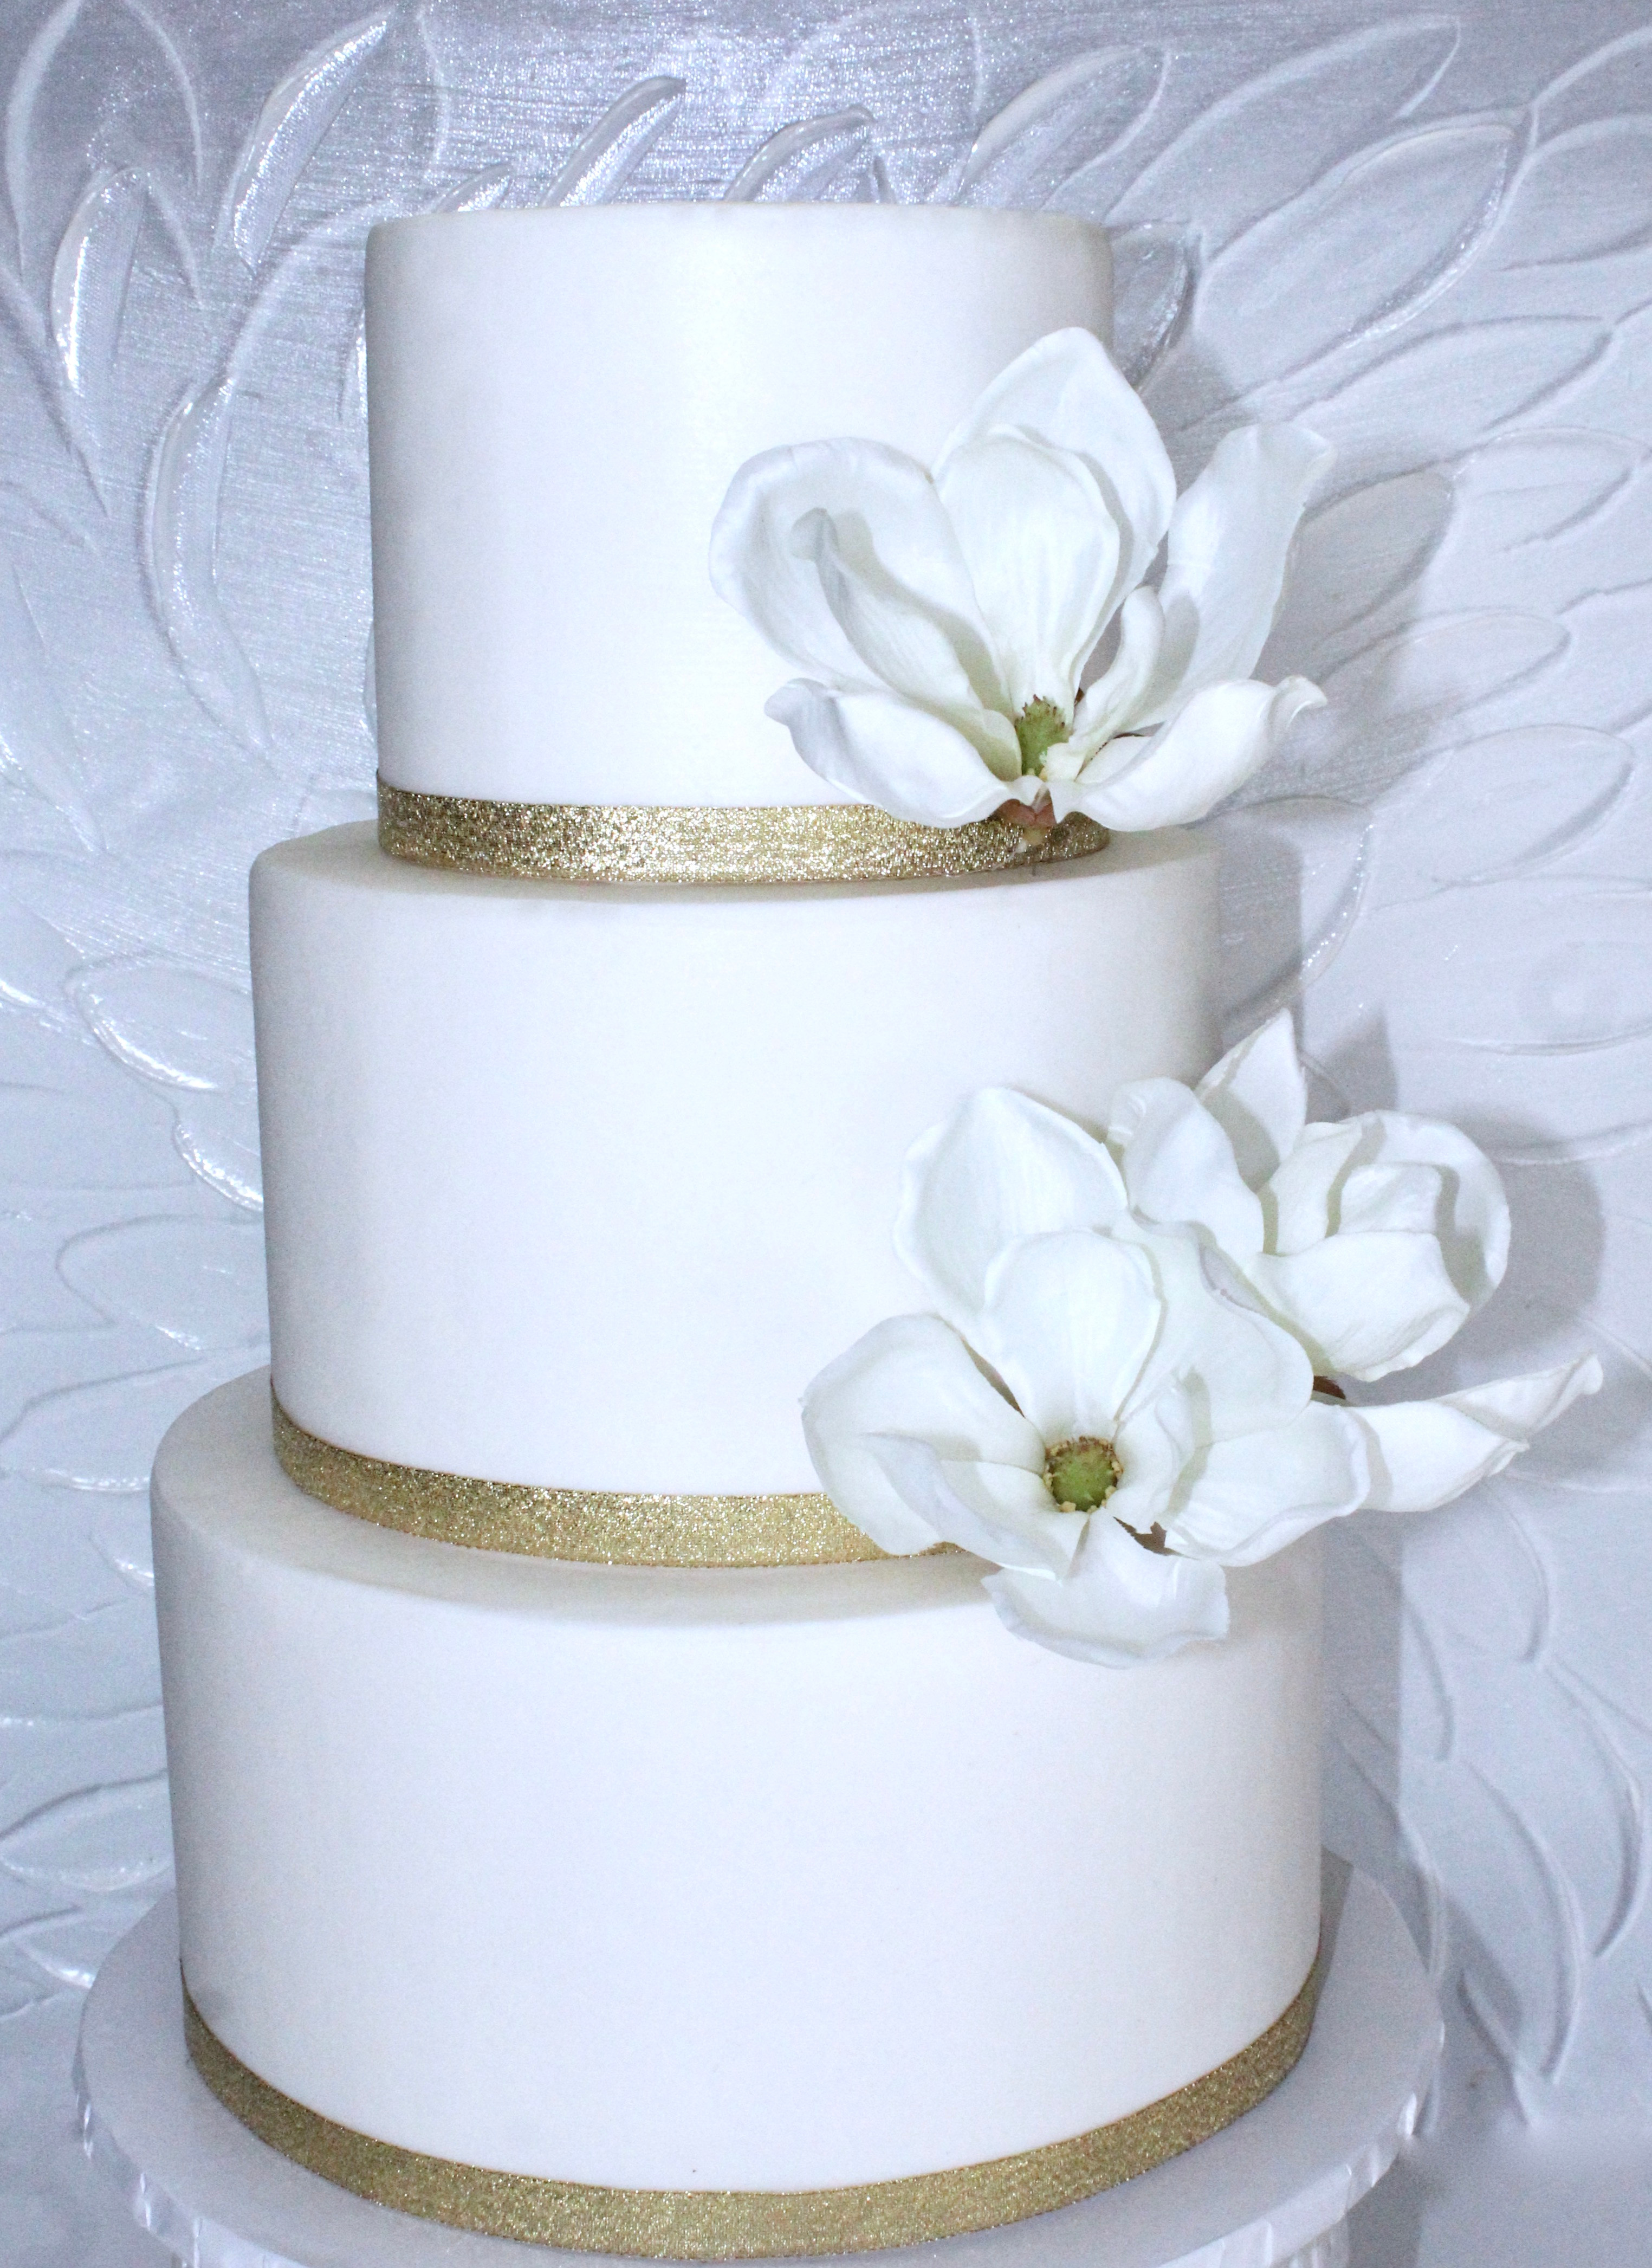 Event and Wedding Cake Design Service